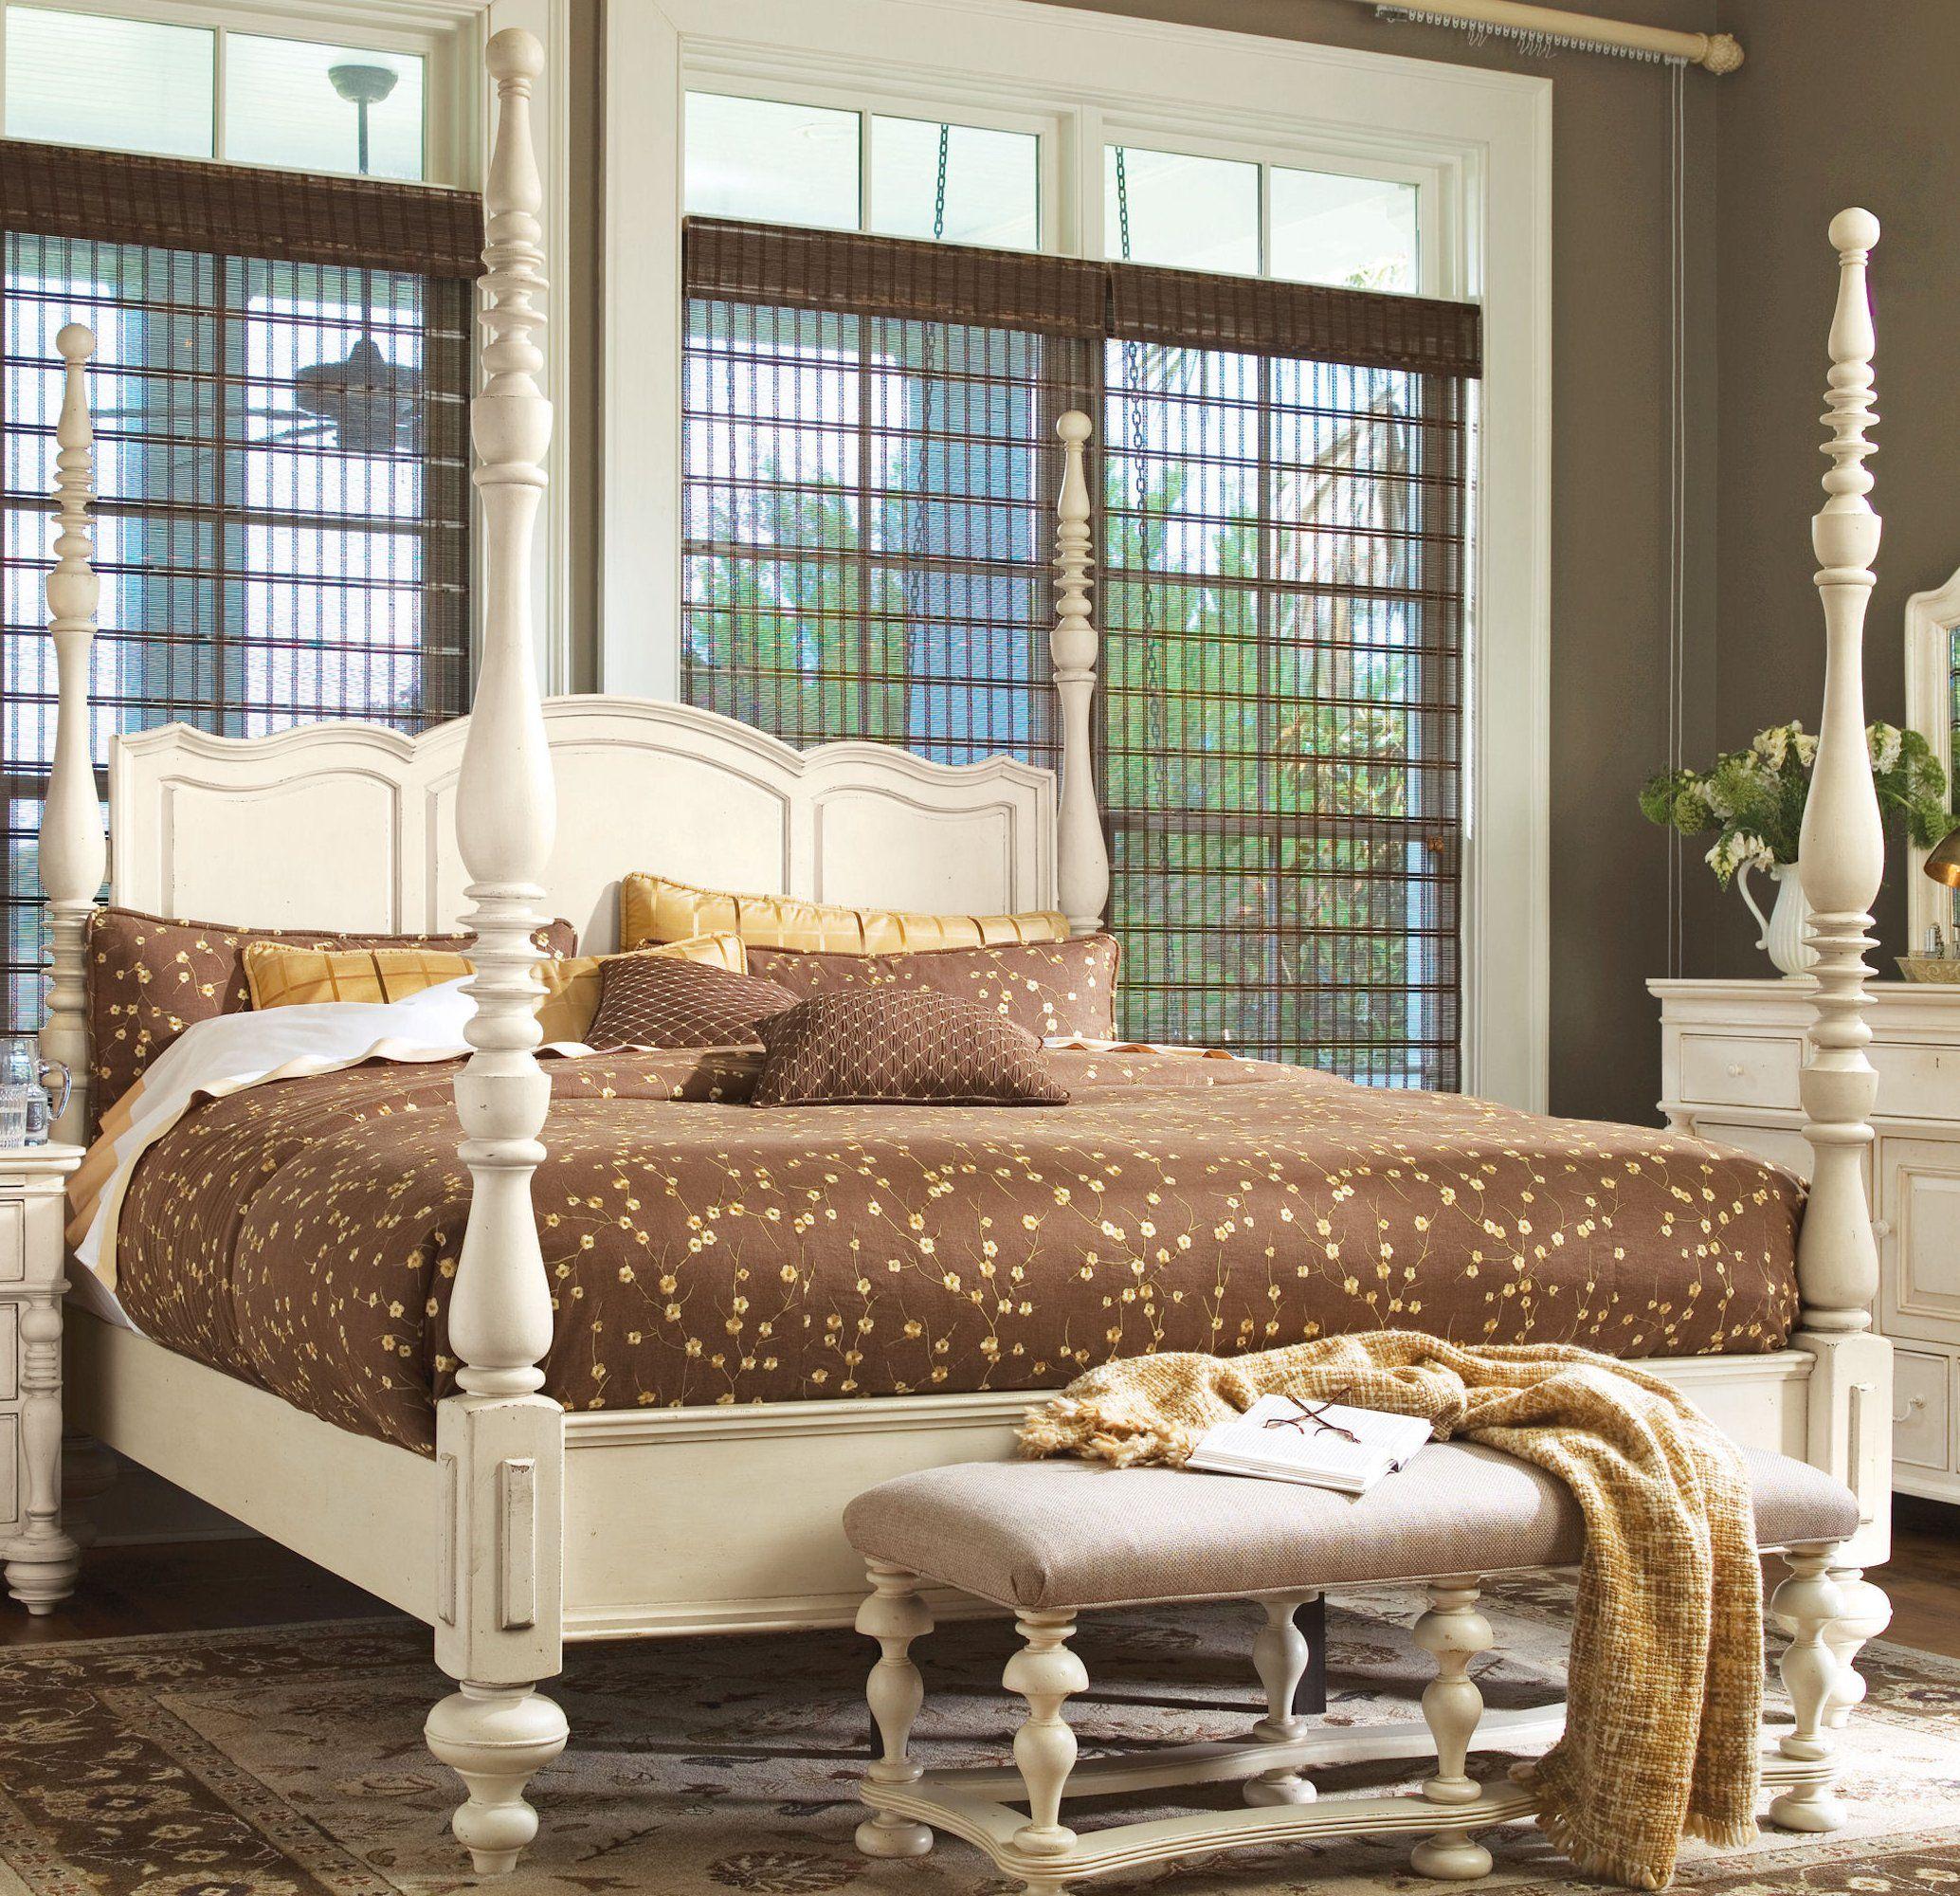 antique white 4 poster bed | household | Pinterest